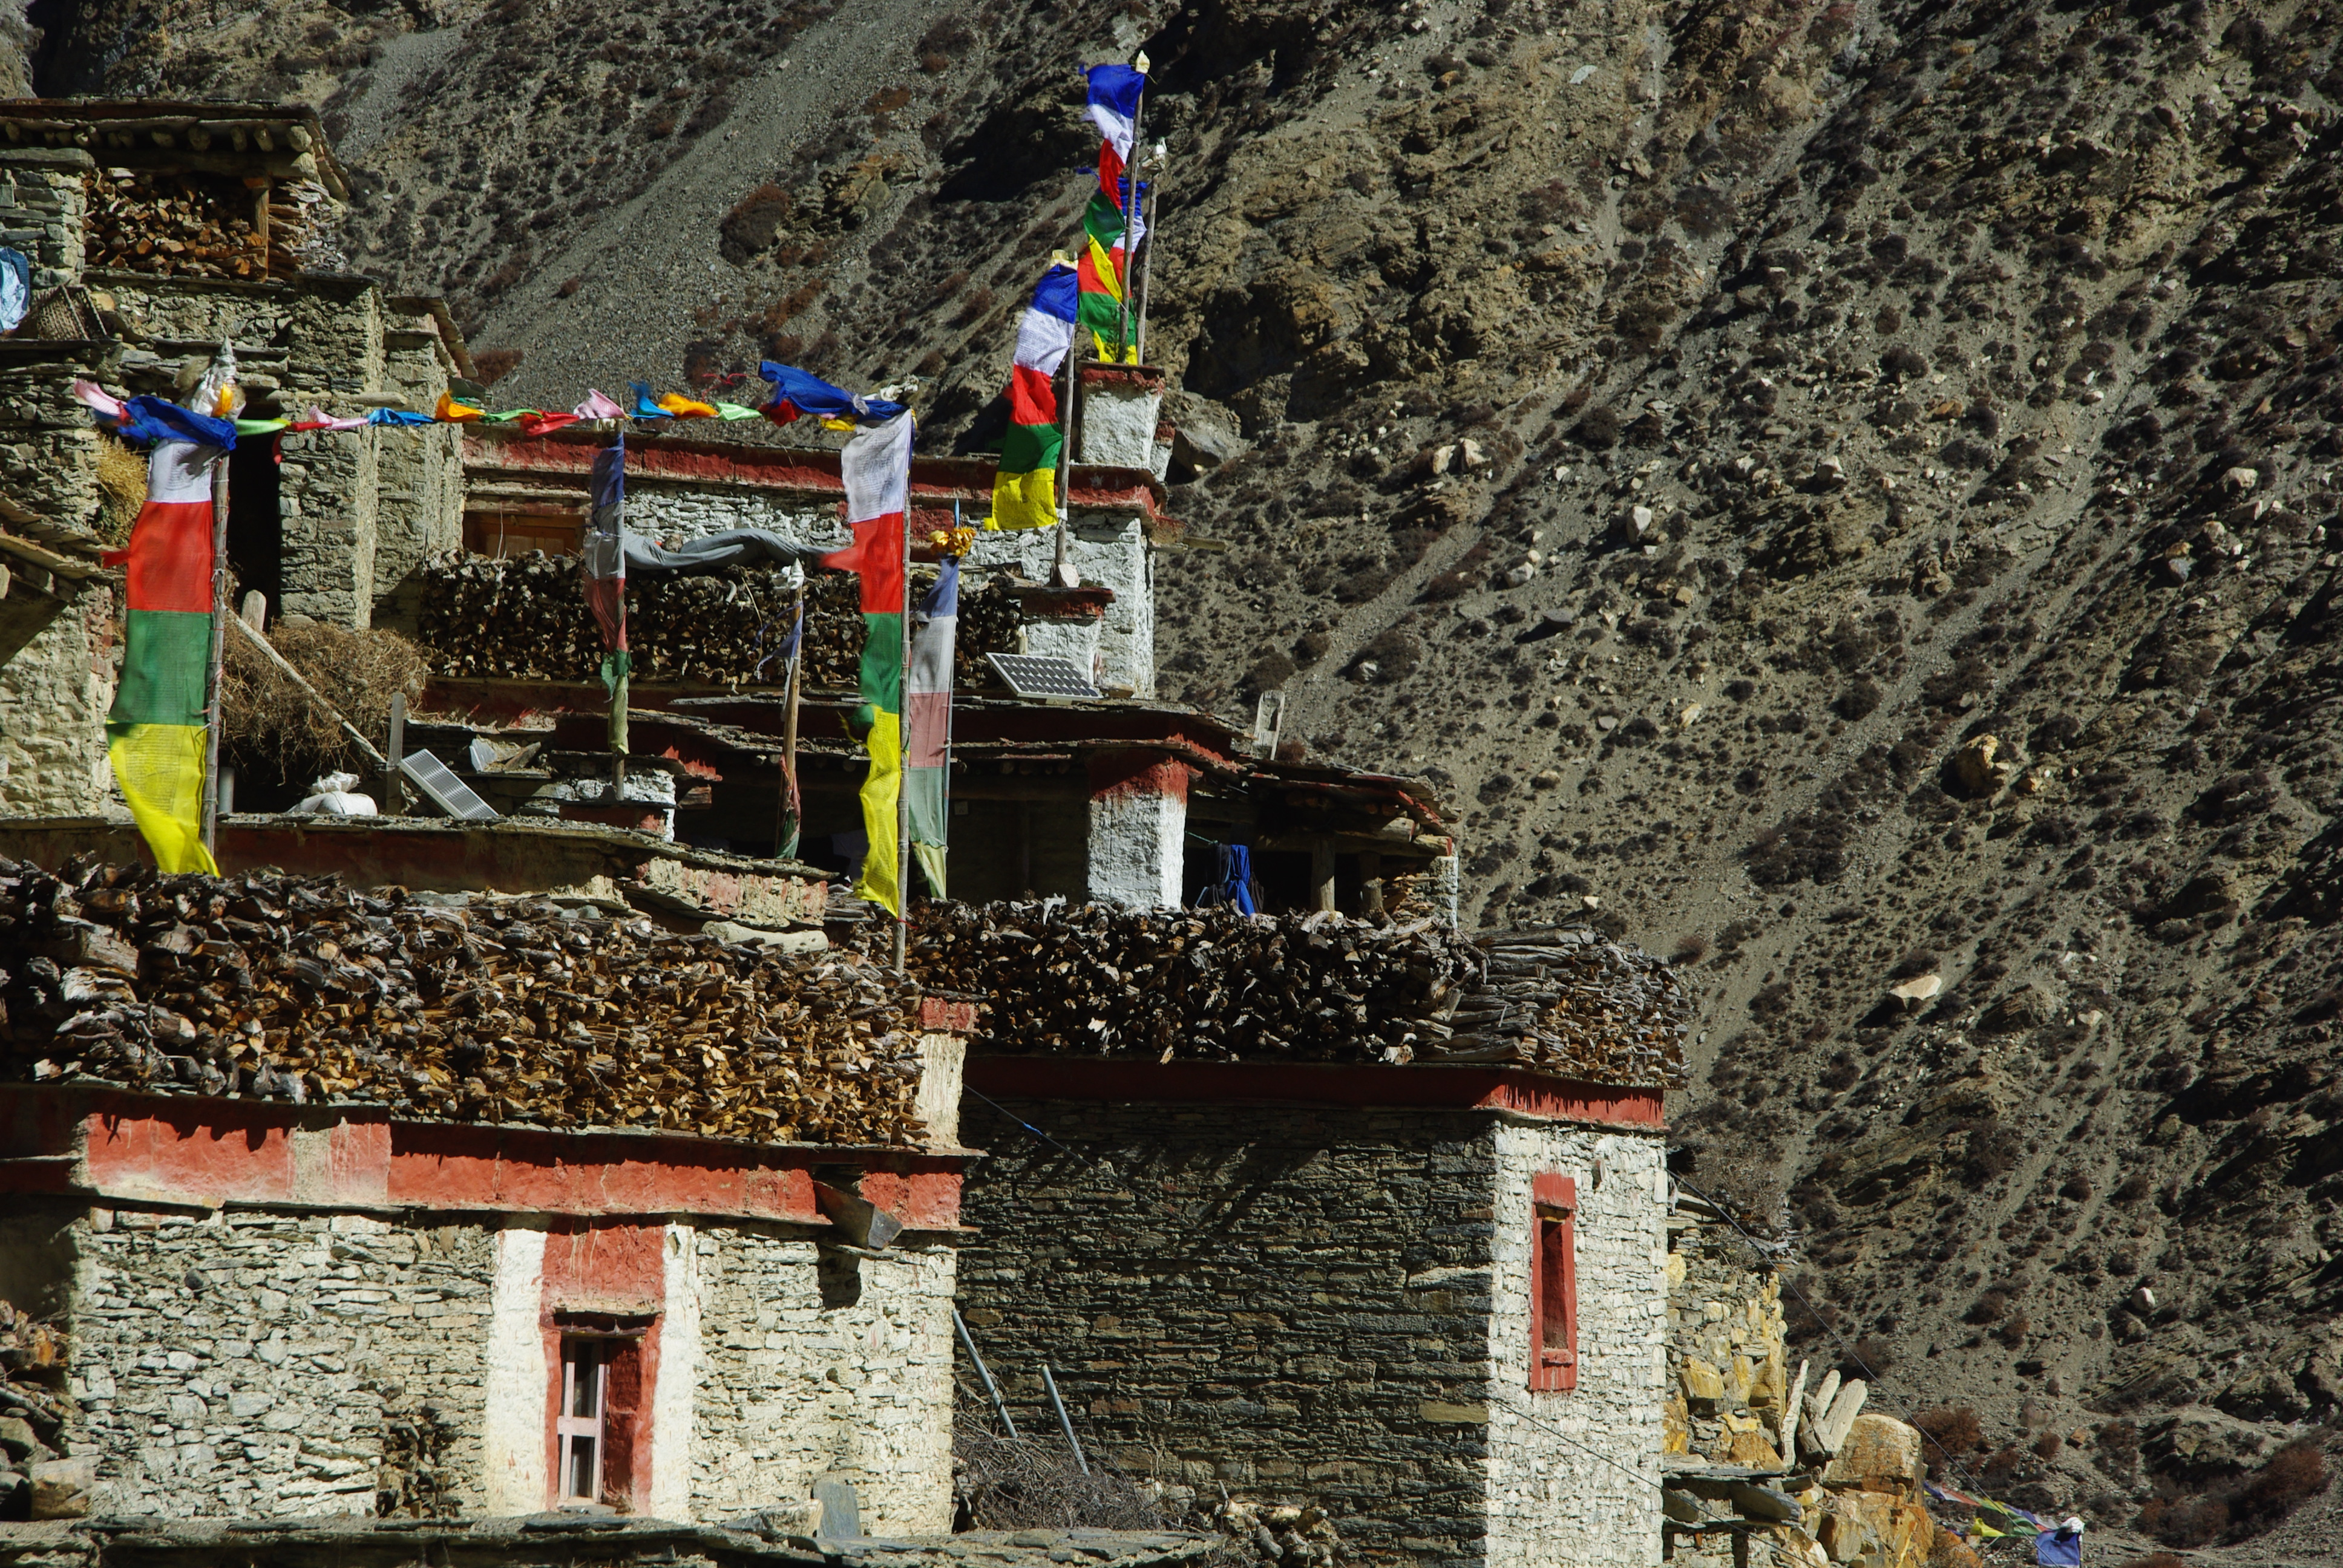 Annapurna VTT Népal